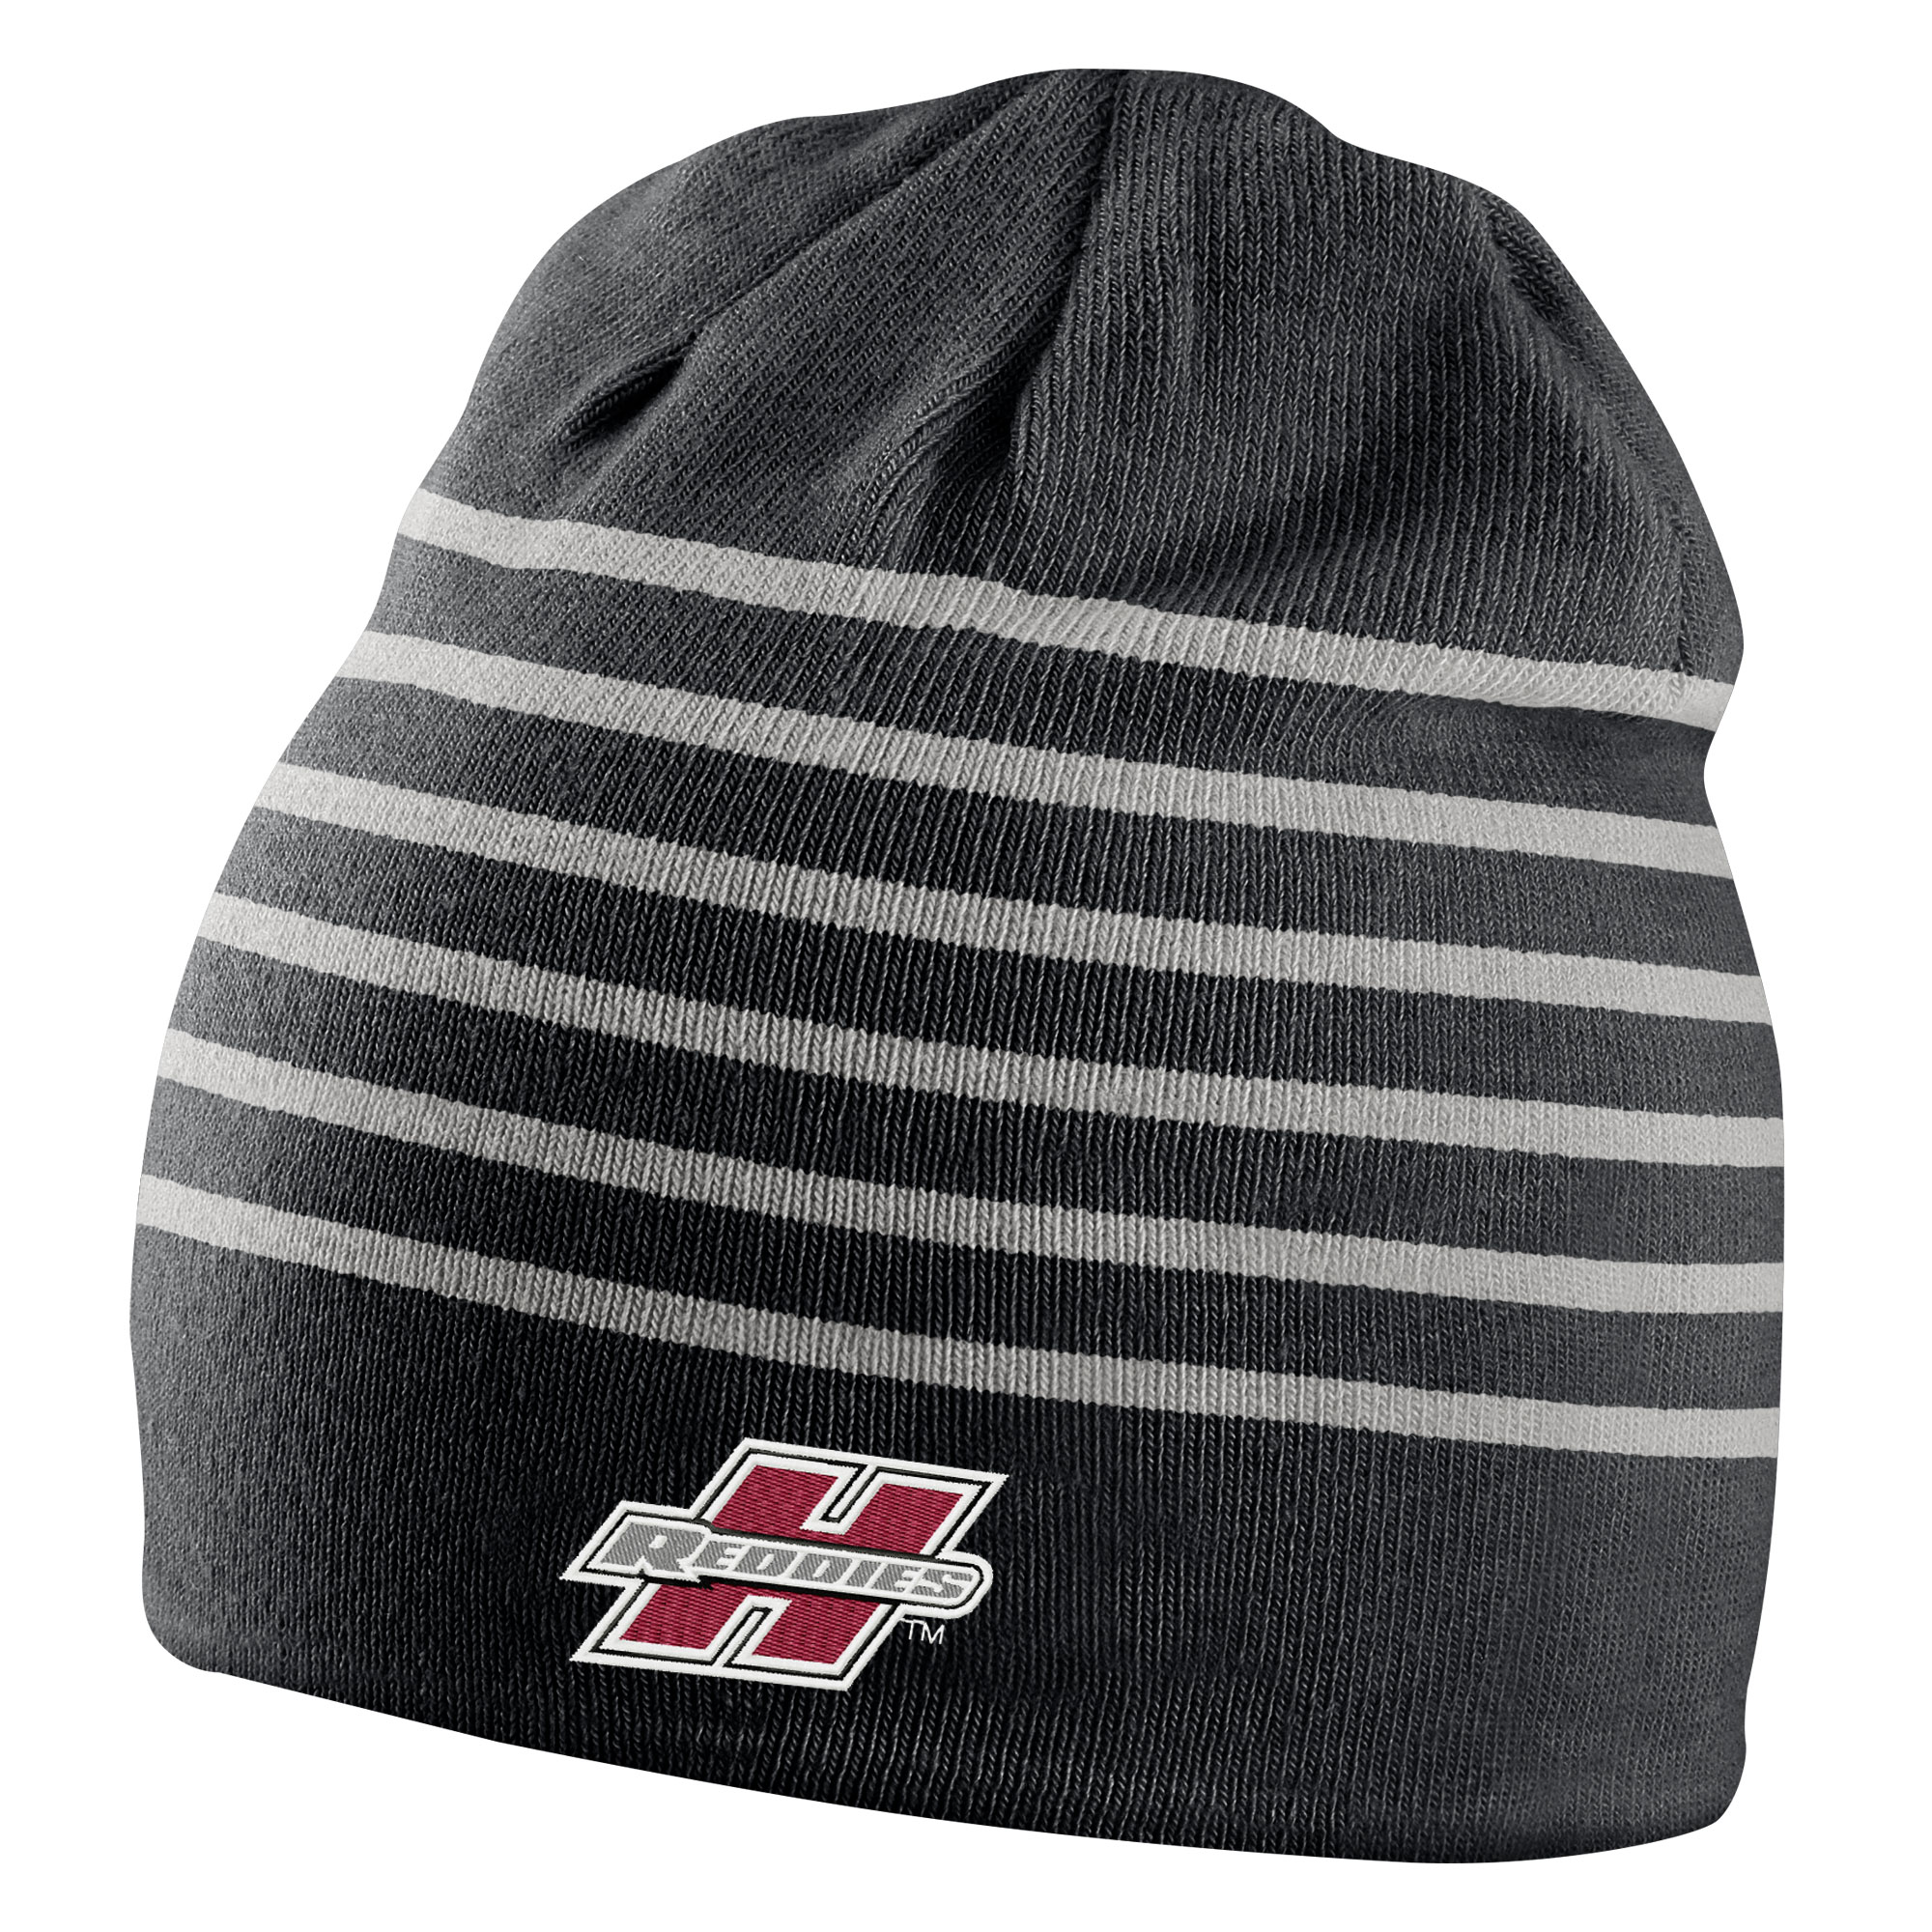 Henderson Reddies Swoosh Multi Stripe Beanie